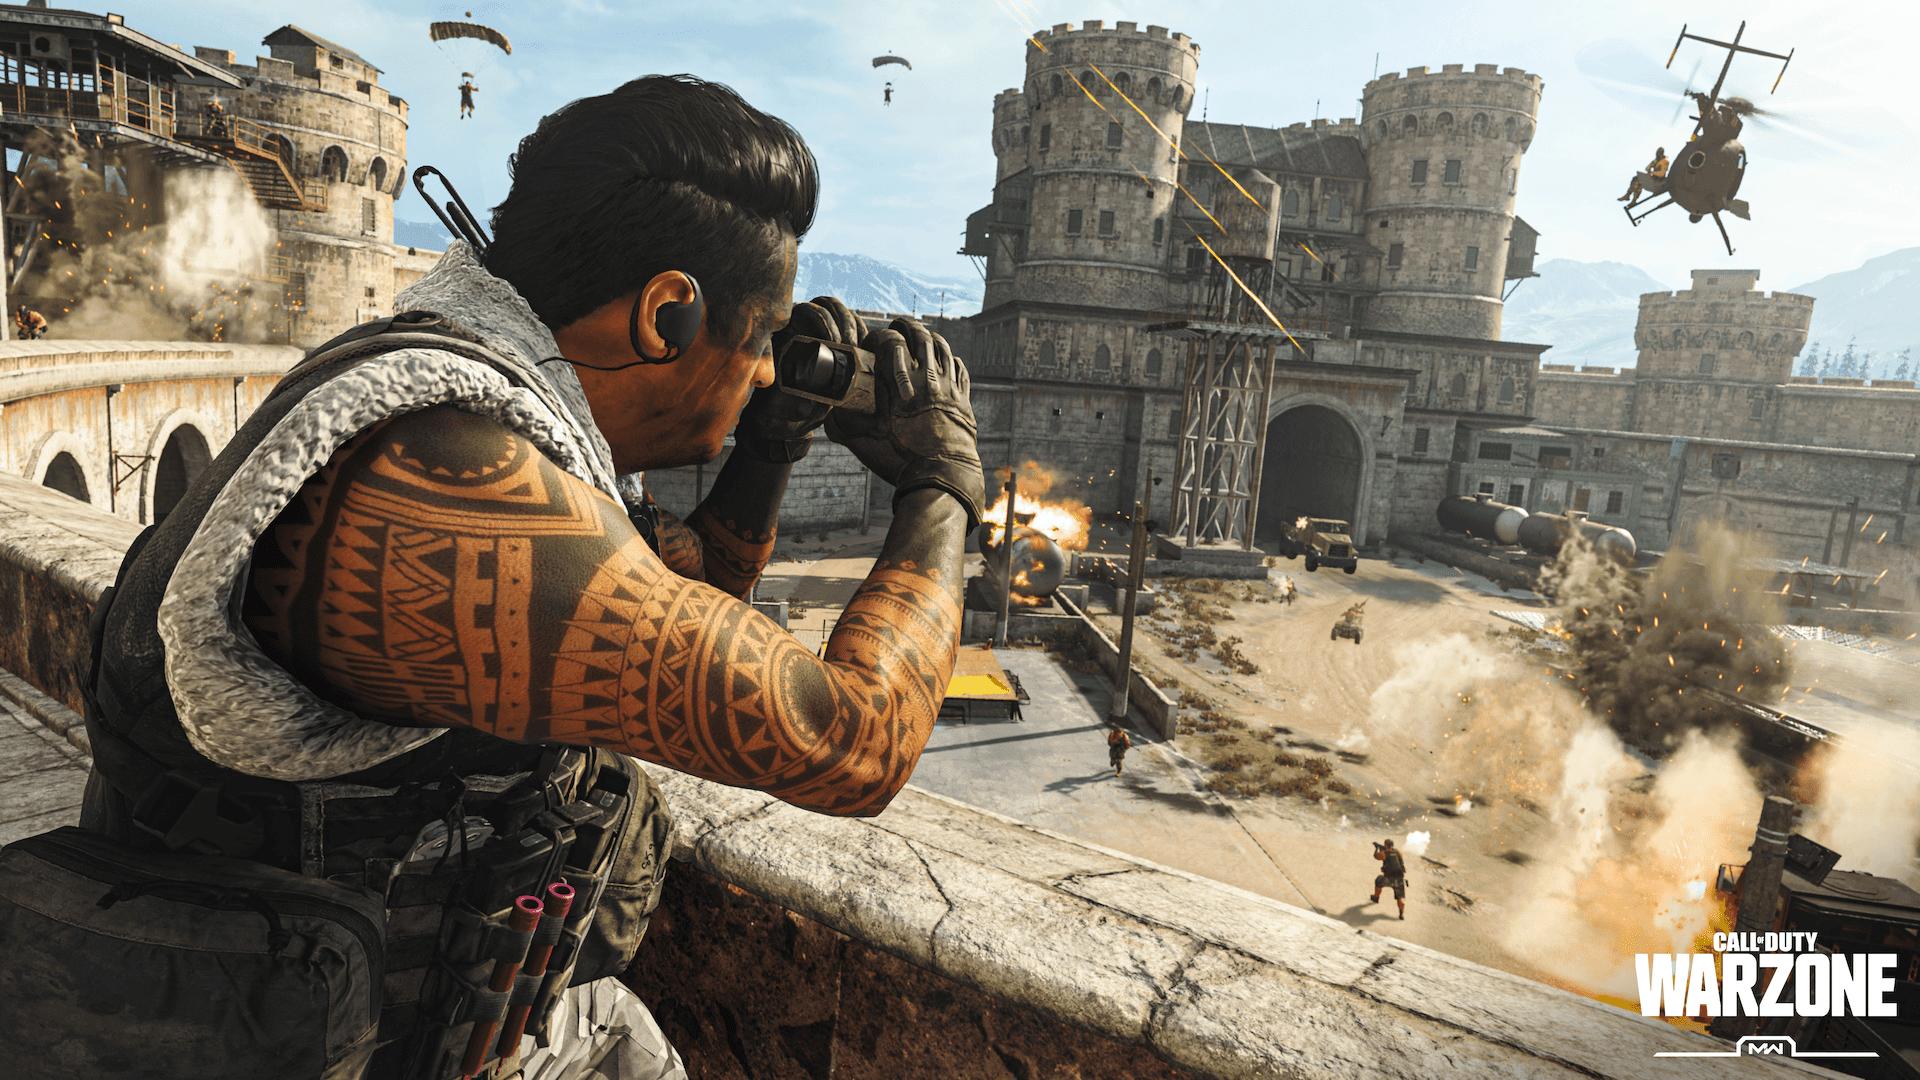 Call of Duty: Warzone press screenshot